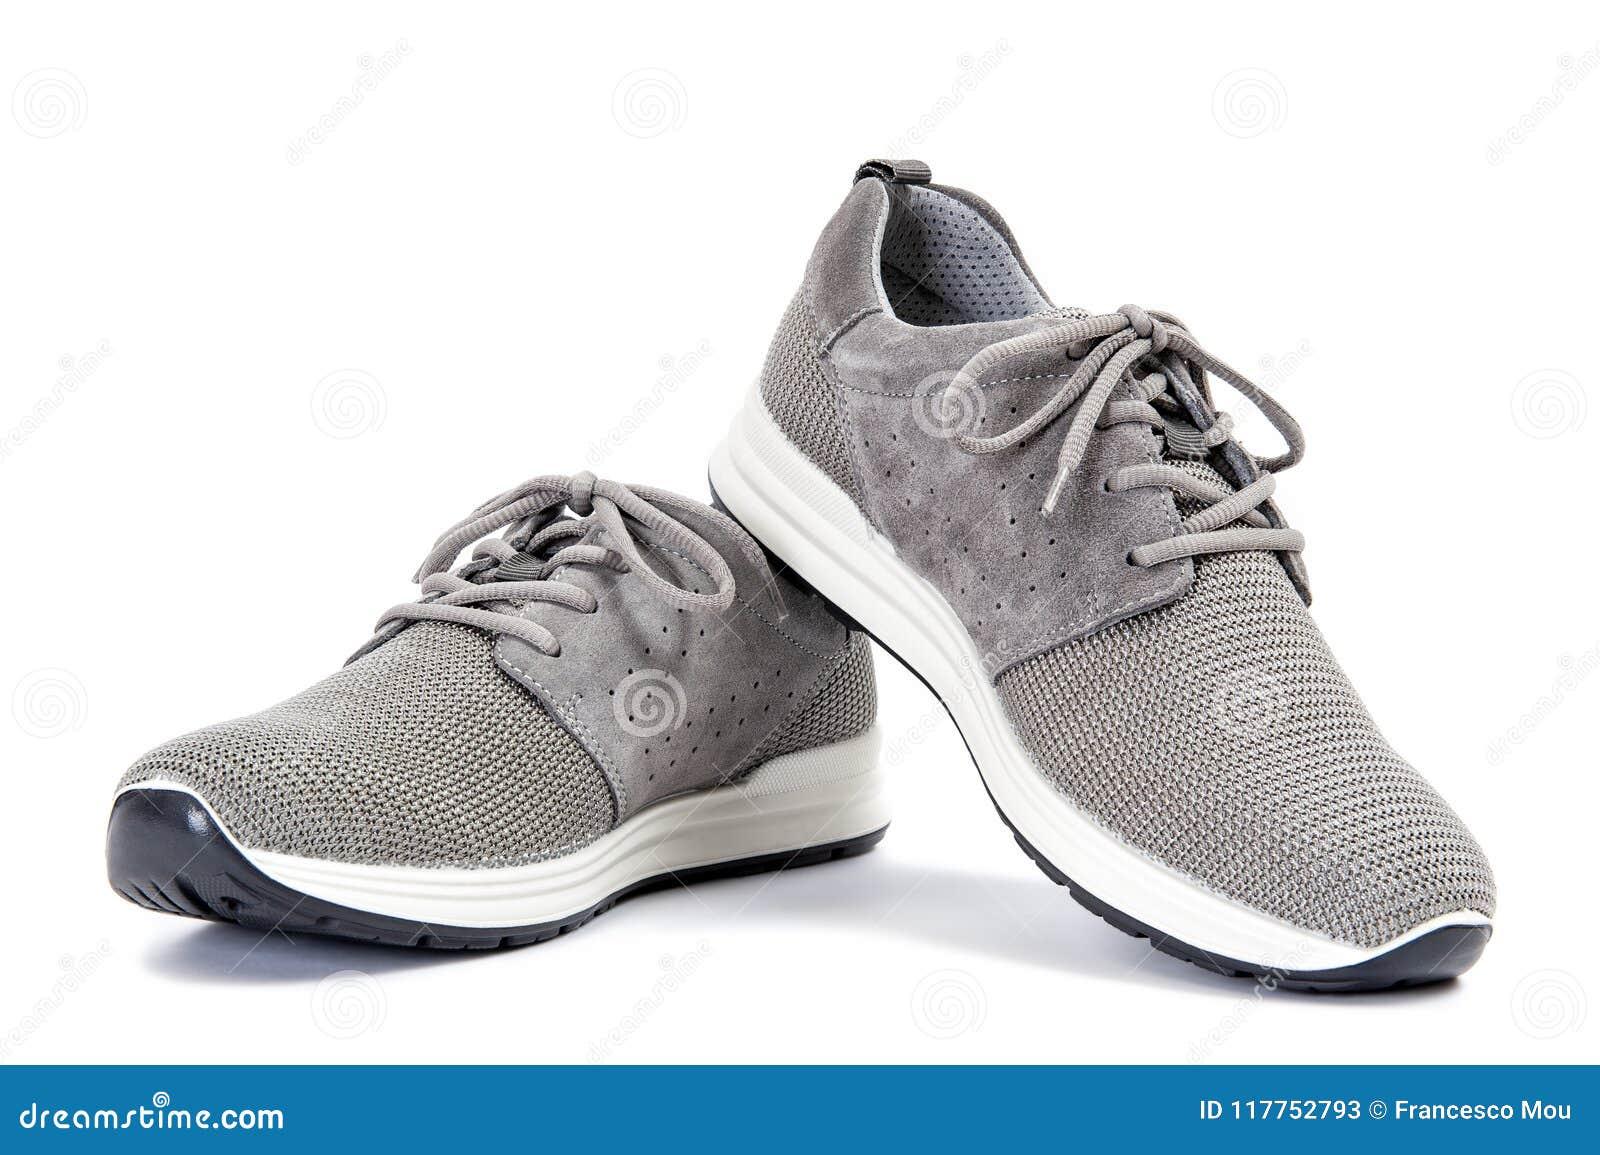 08f54e5b7c El primer de los zapatos grises elegantes del deporte para el hombre adulto  fotografió en el fondo blanco